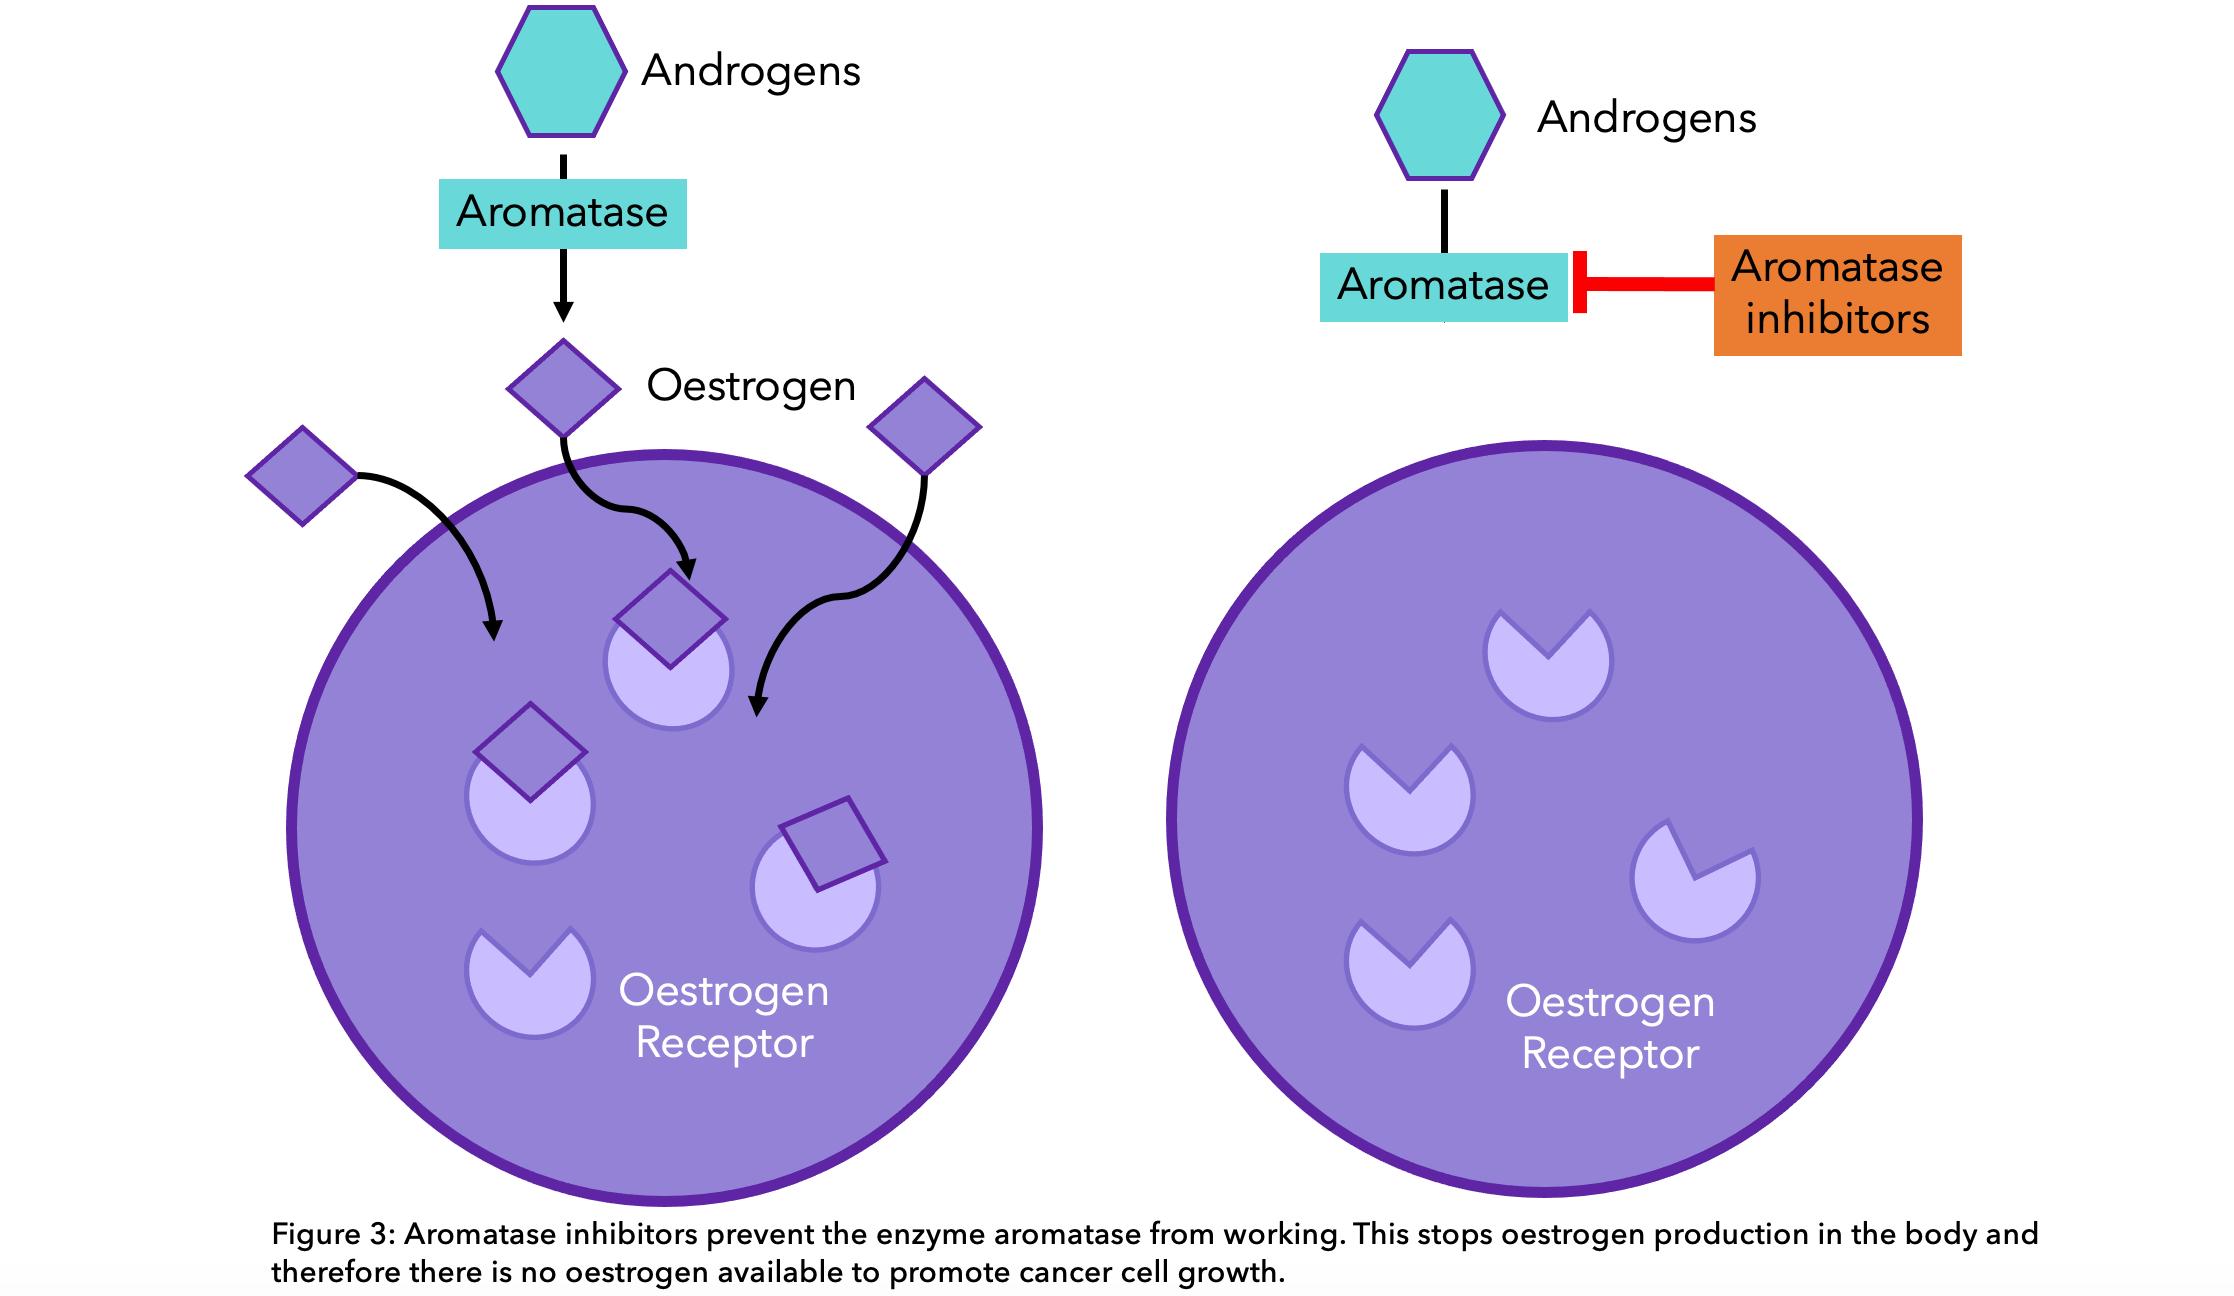 Diagram showing how aromatase inhibitors work